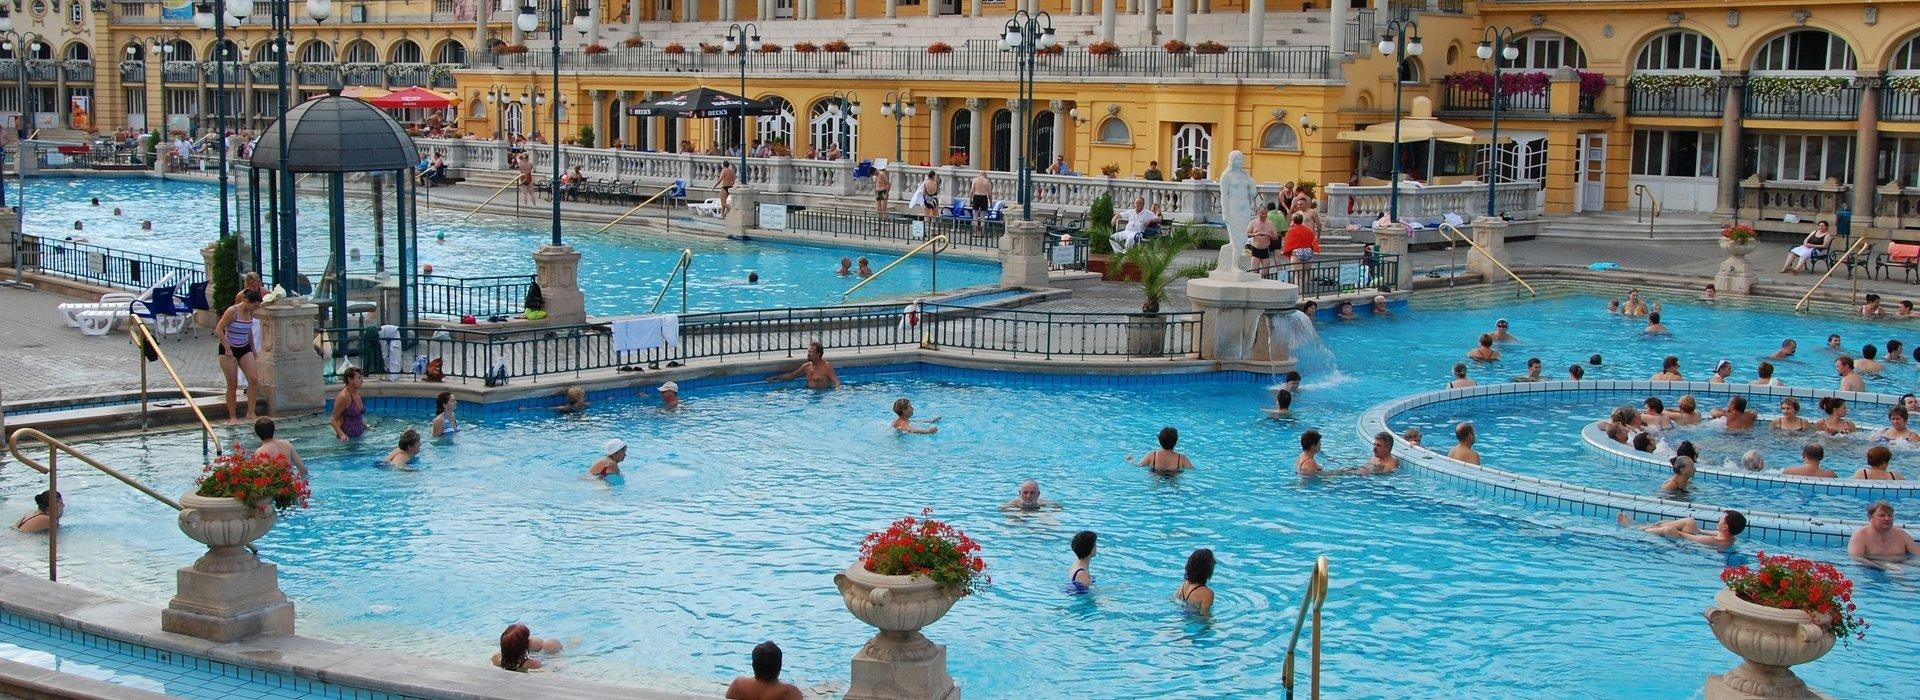 Budapest Badestadt